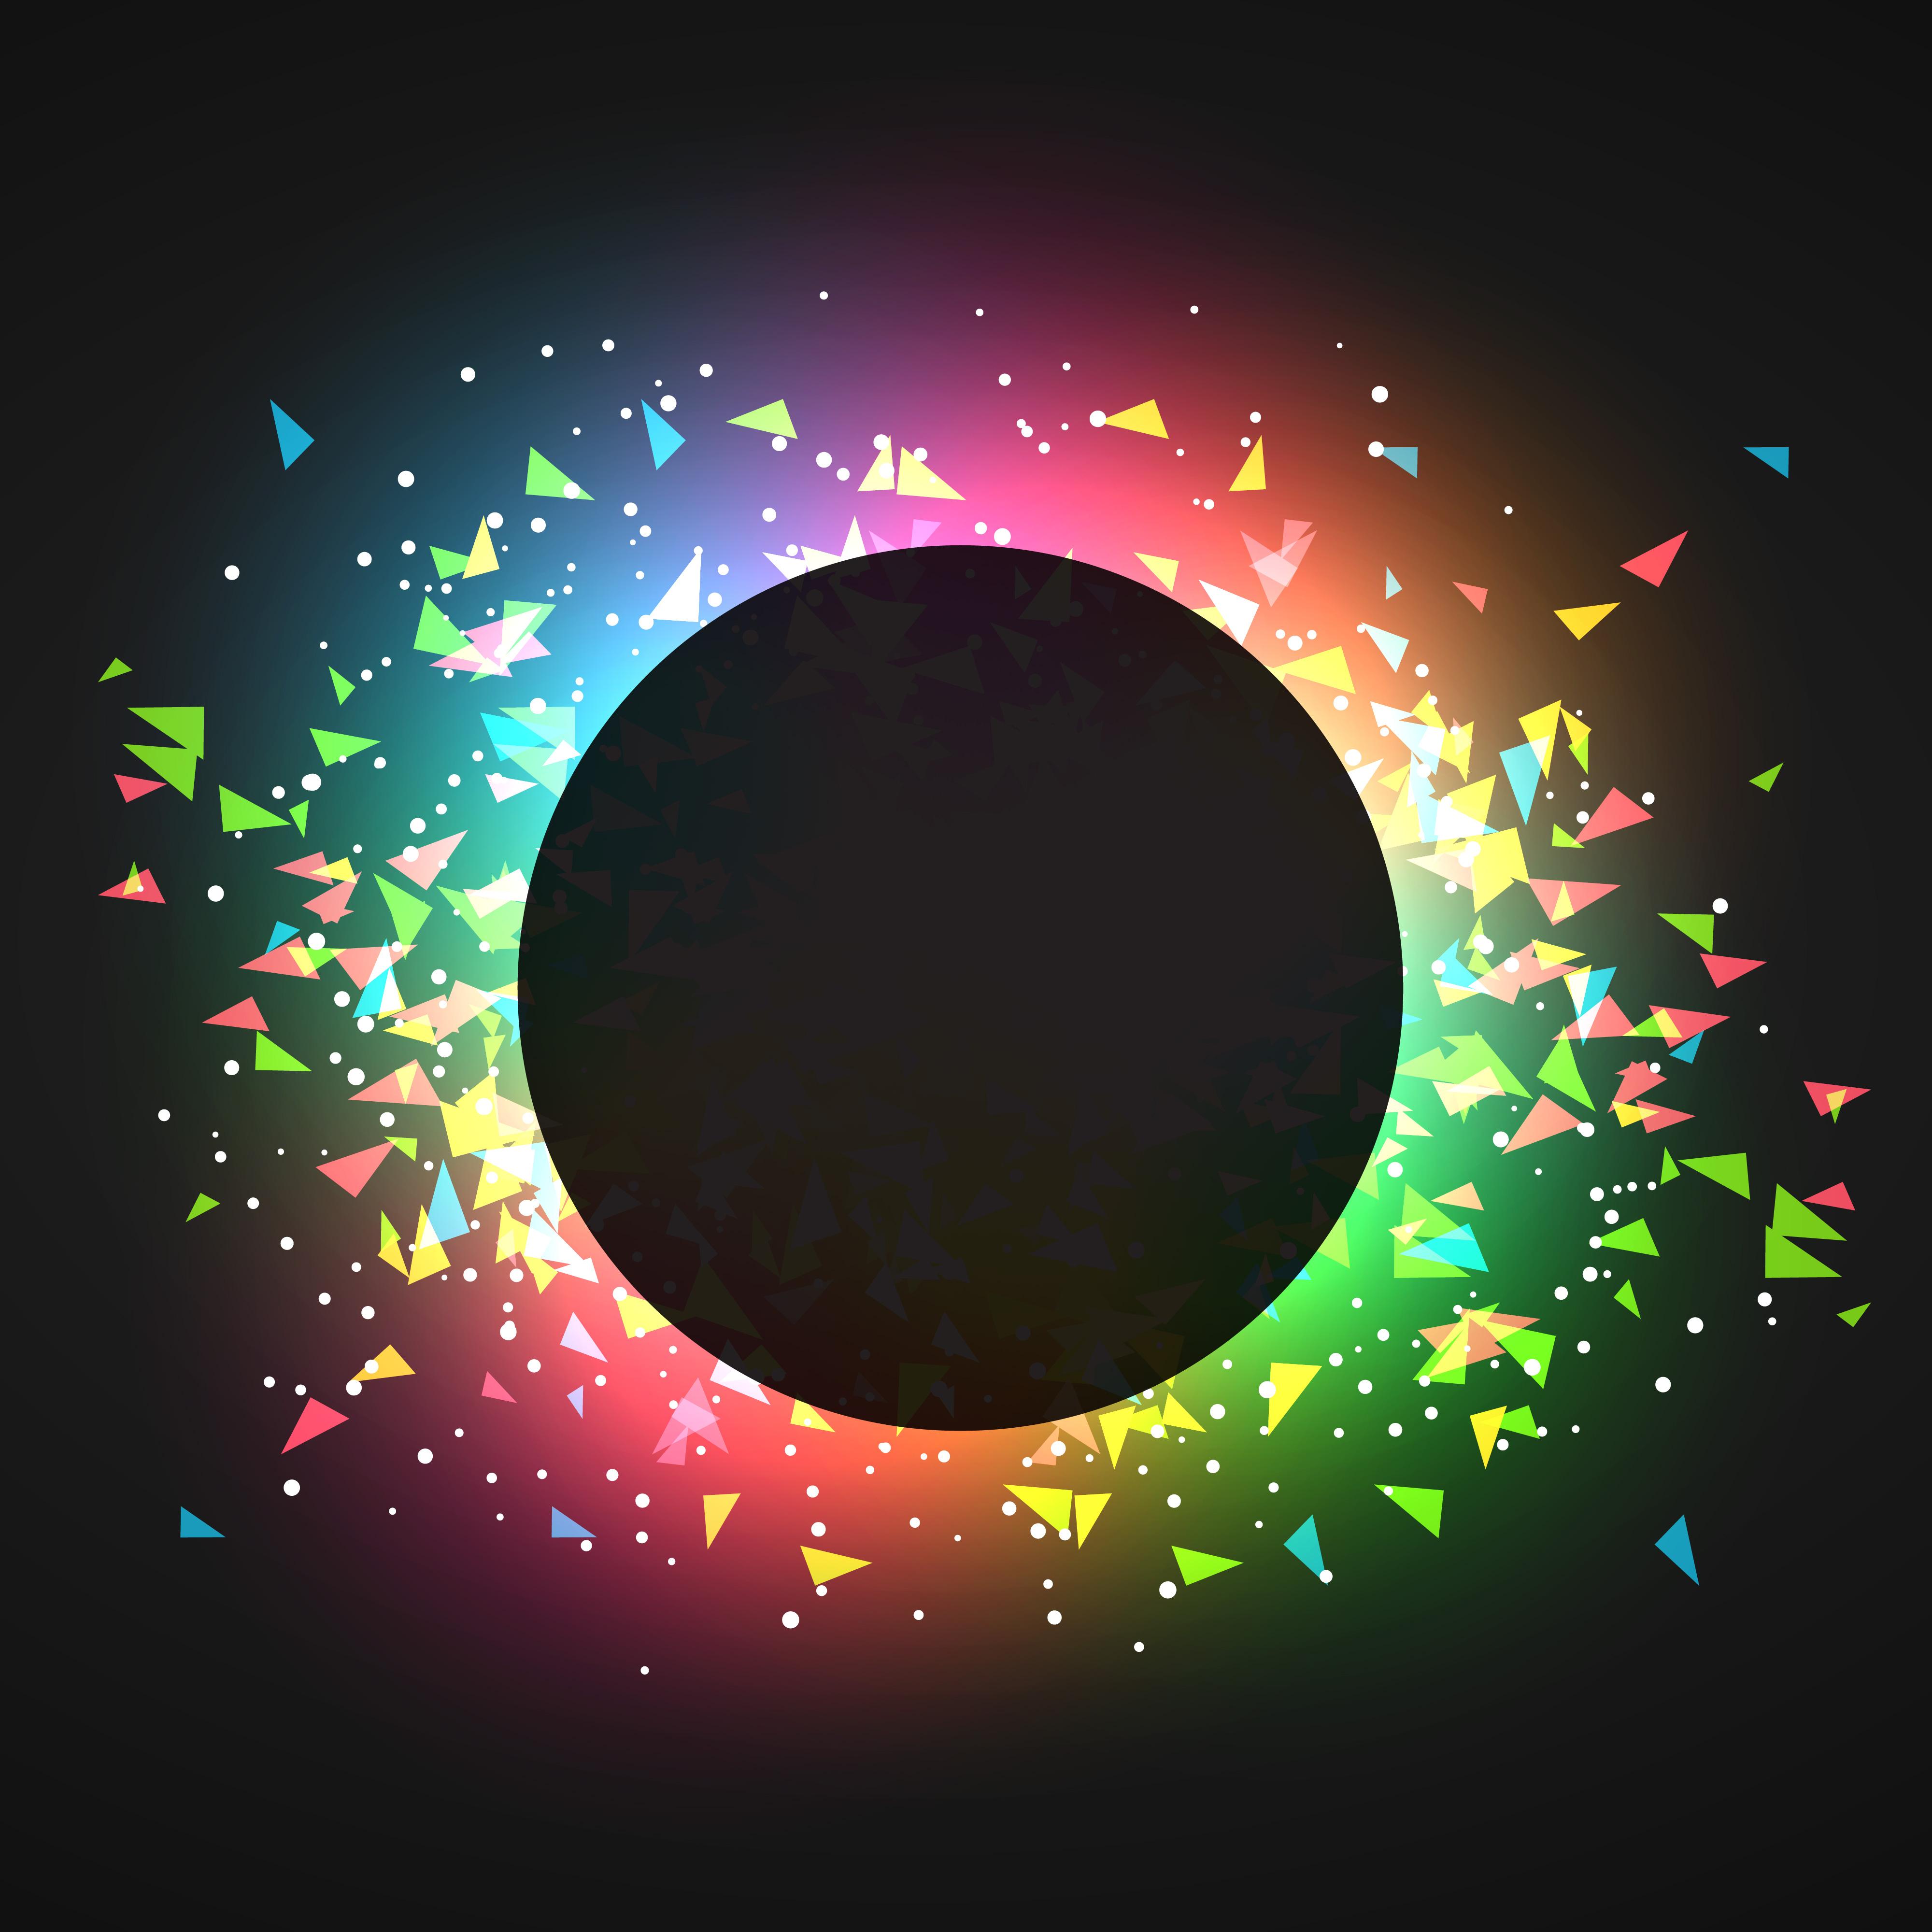 Abstract Confettin Glowing Dark Background Vector Logo Shabby Gratis